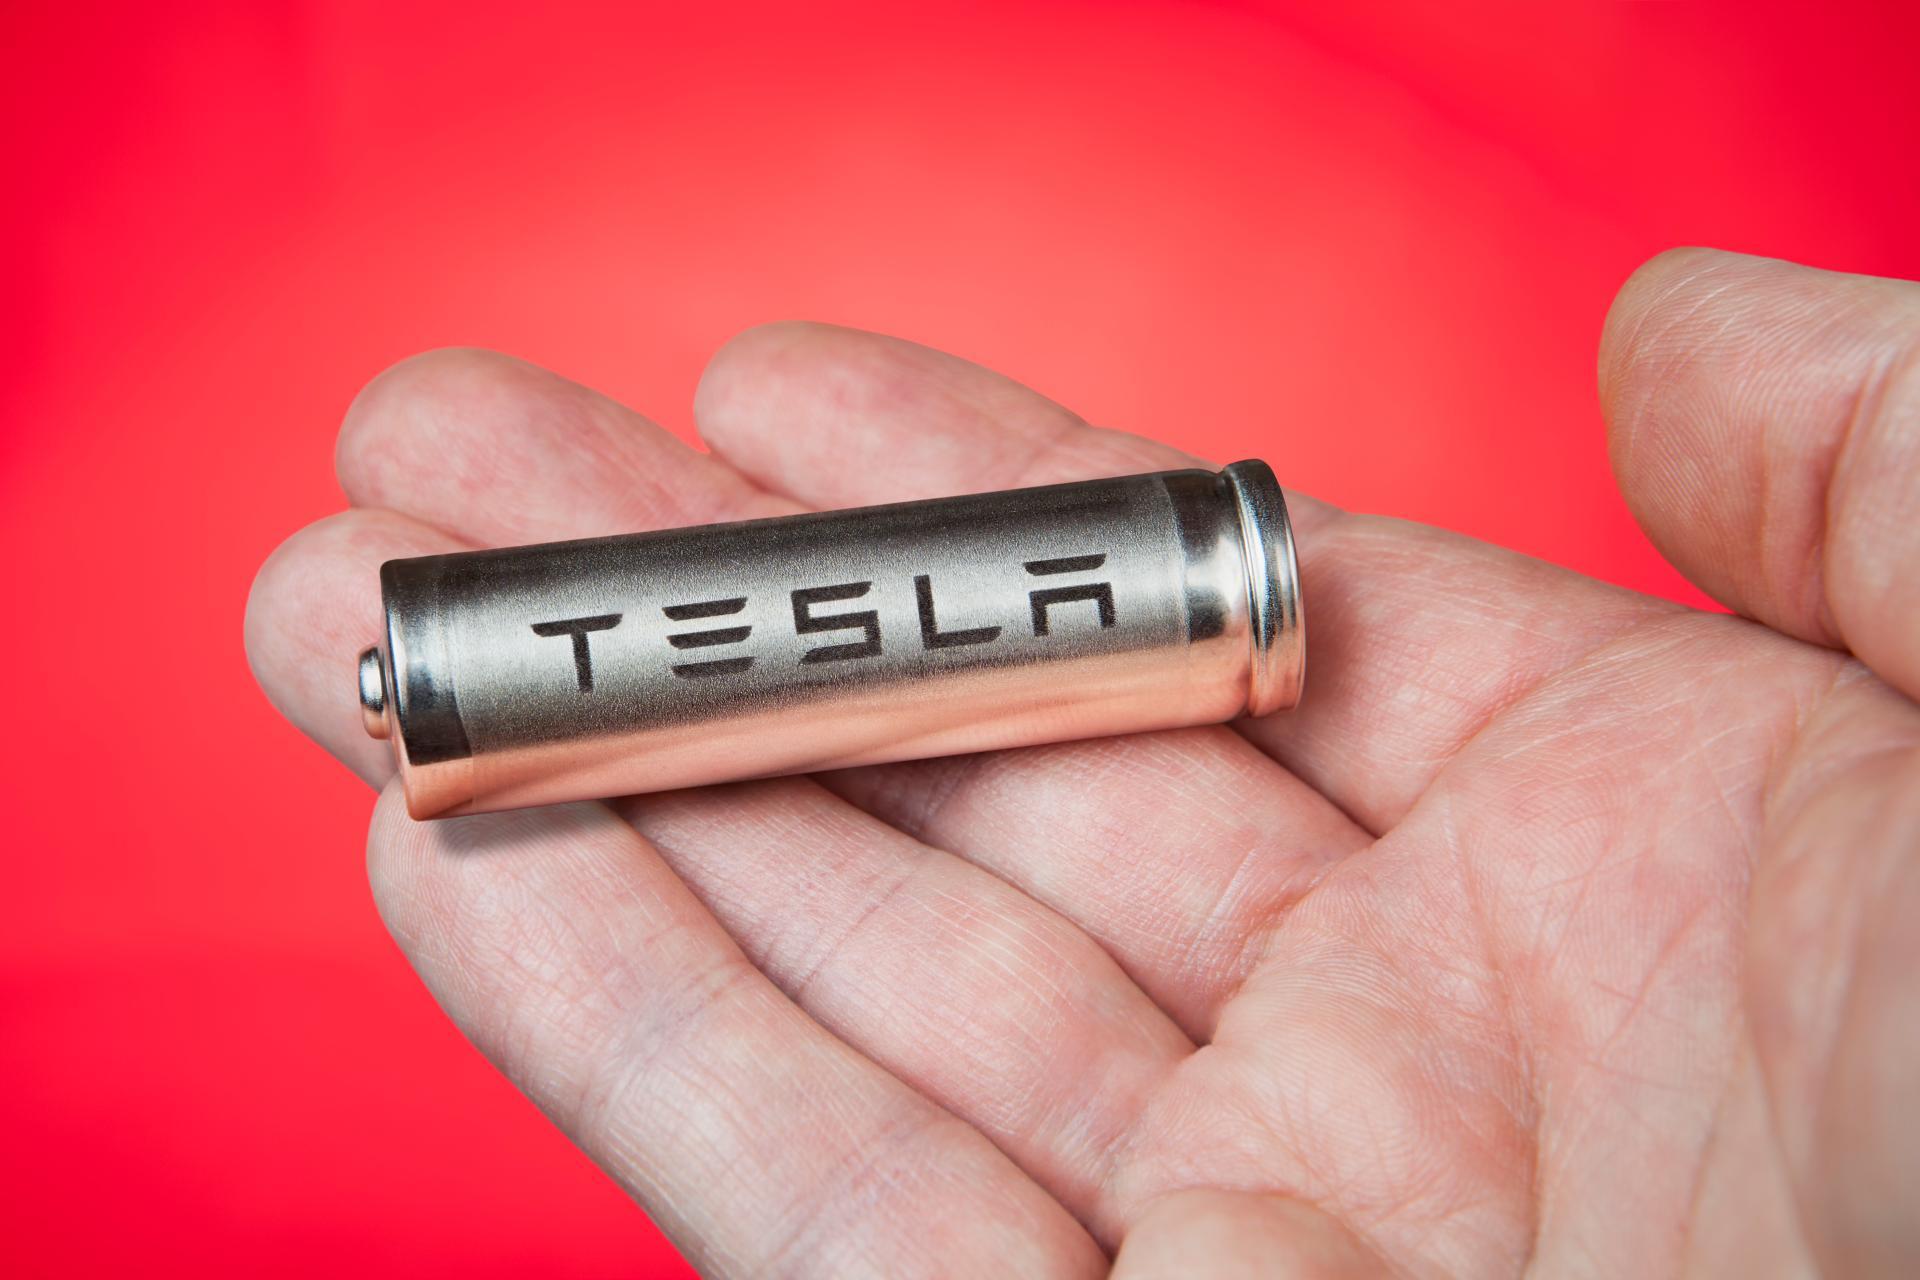 Panasonic soll ab 2021 Prototypen der neuen Tesla-Batterie 4680 bauen